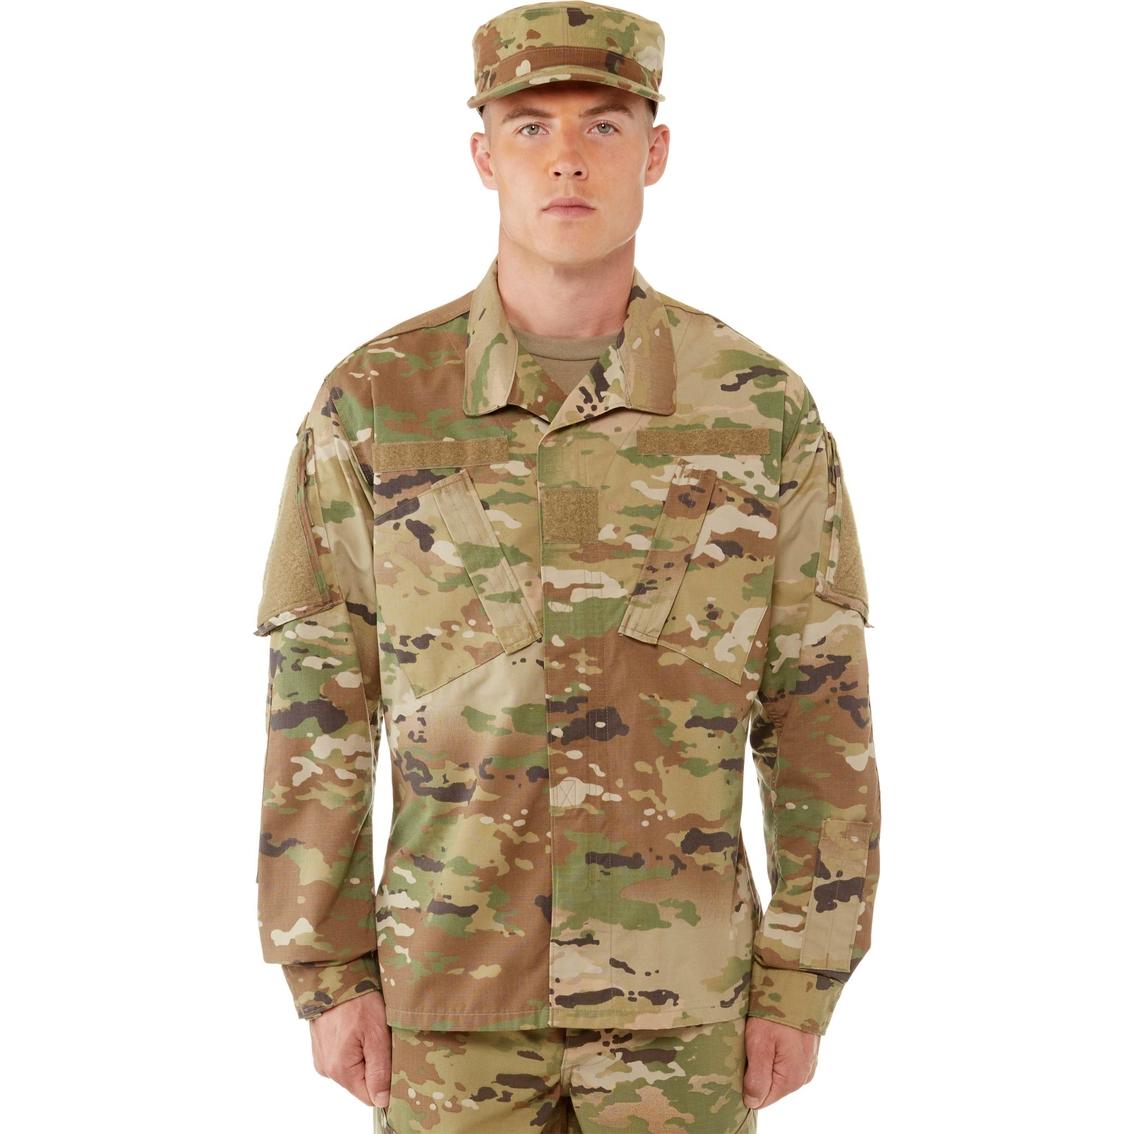 Dlats Army Ocp Acu Coat Ocp Acu Military Shop The Exchange